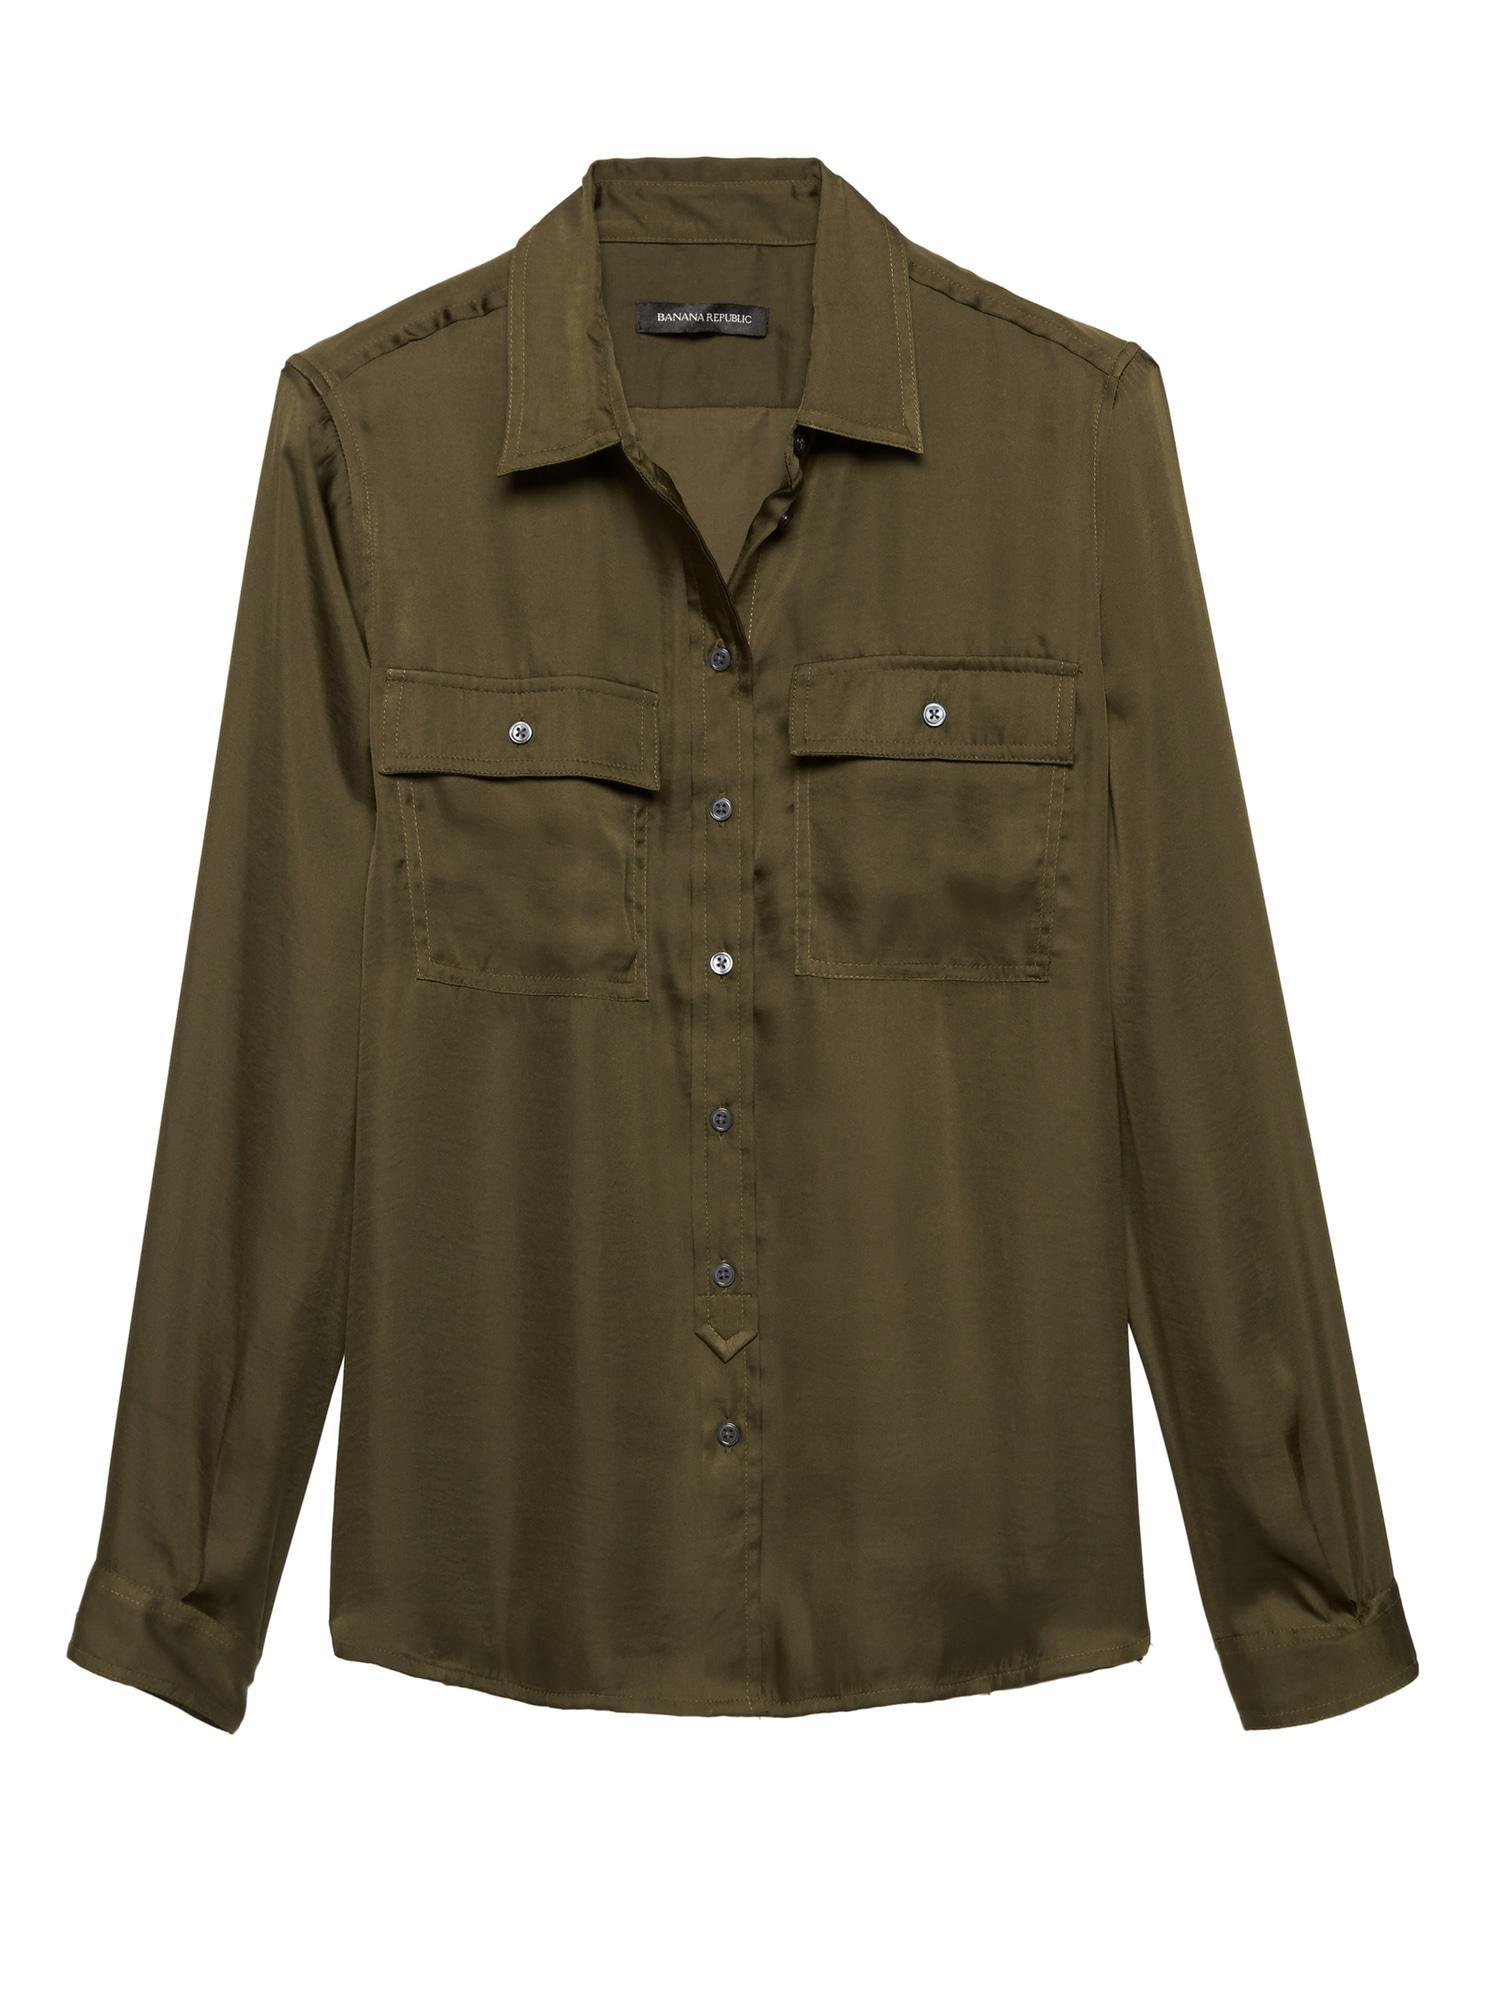 661552ccc7153 Banana Republic - Green Dillon Classic-fit Soft Satin Utility Shirt - Lyst.  View fullscreen